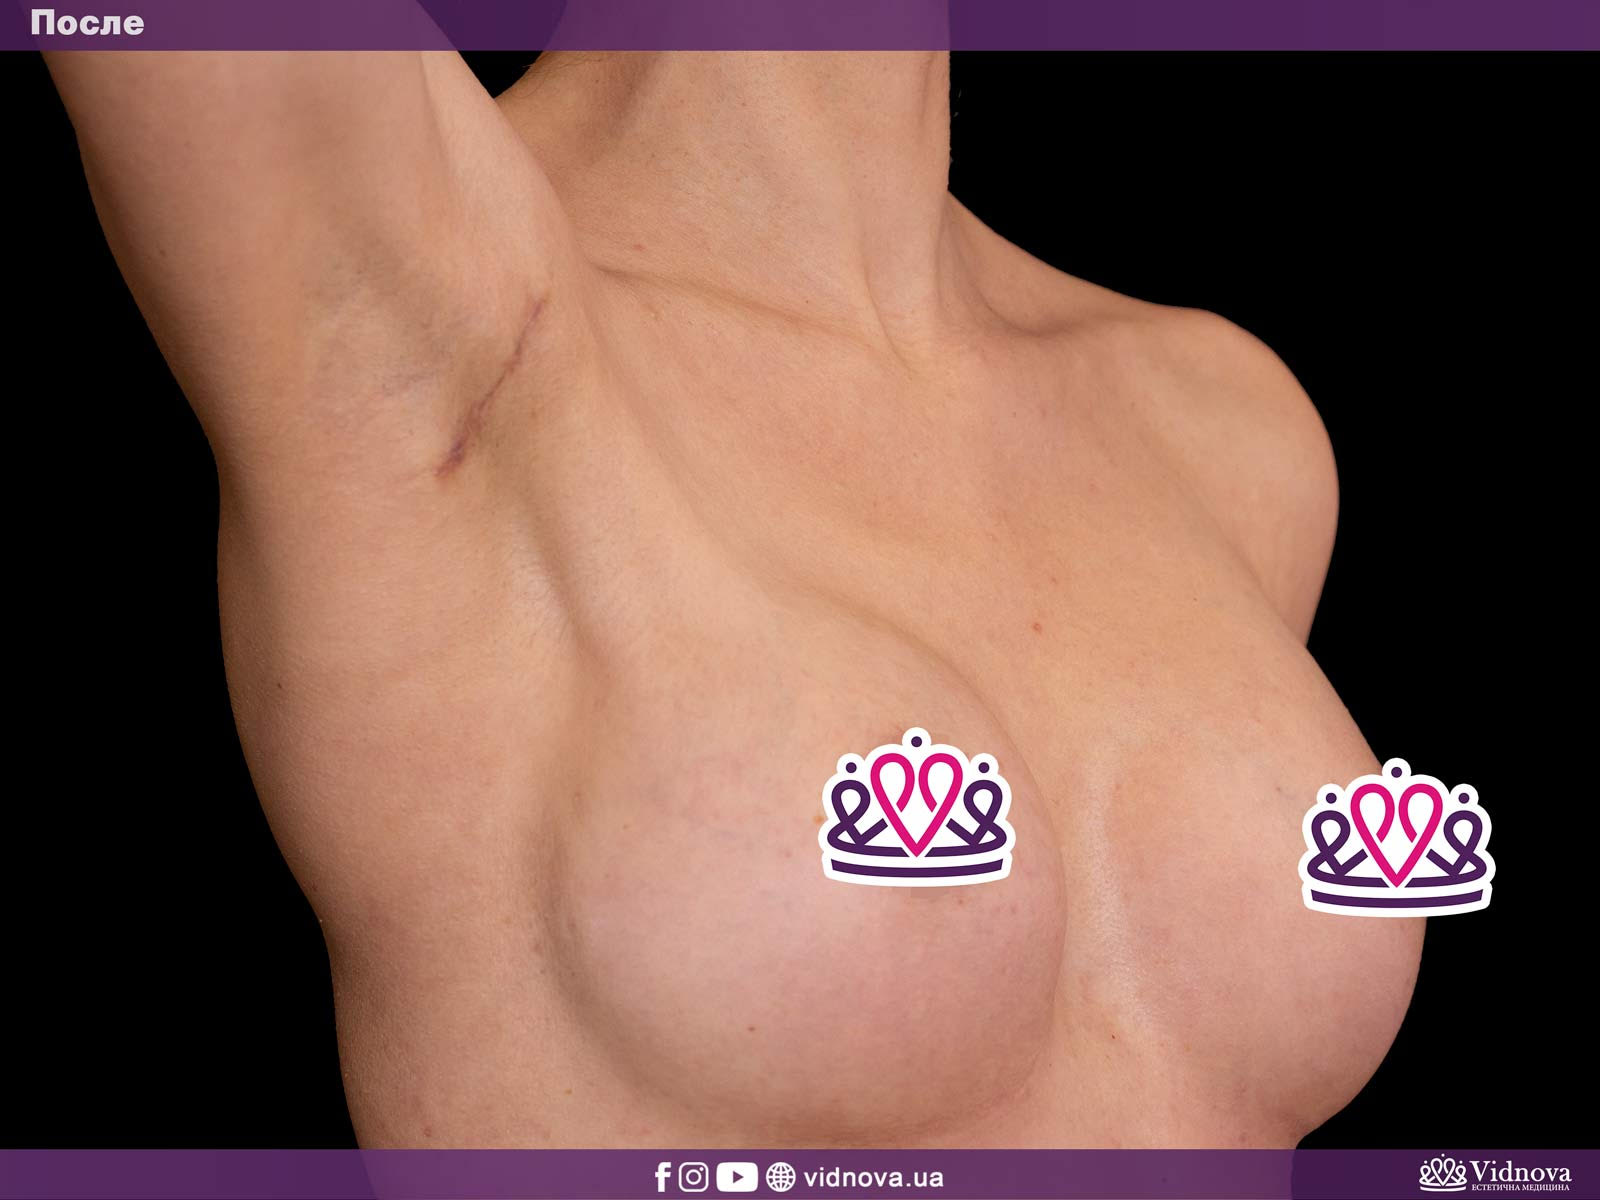 Увеличение груди: Фото ДО и ПОСЛЕ - Пример №6-2 - Клиника Vidnova